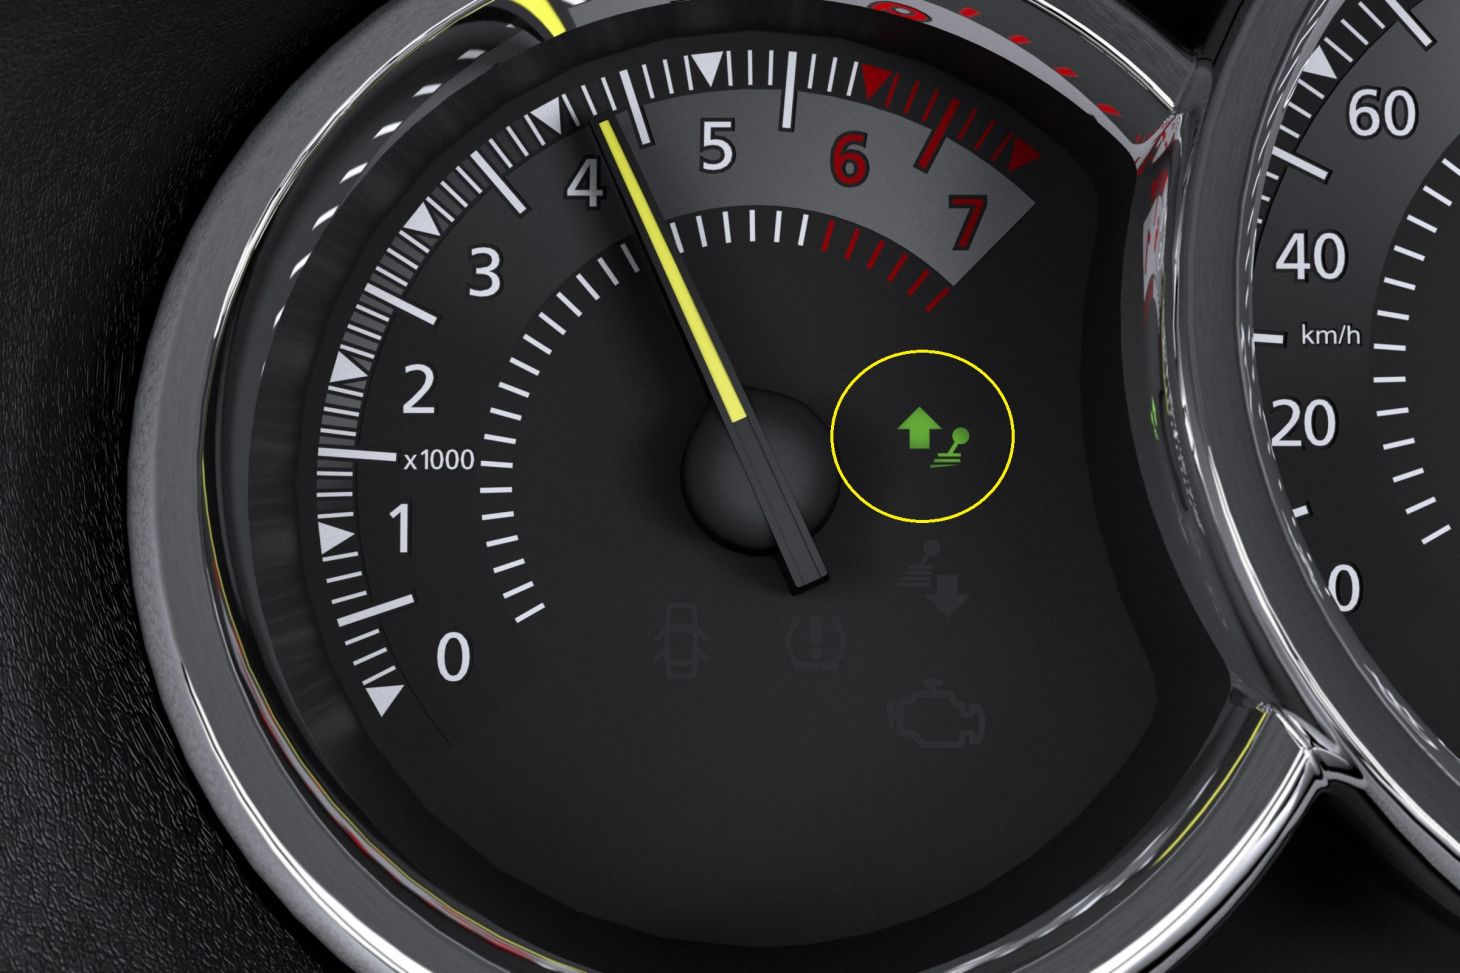 indicador troca marcha logan dynamique em detalhe circulo amarelo economizar combustivel